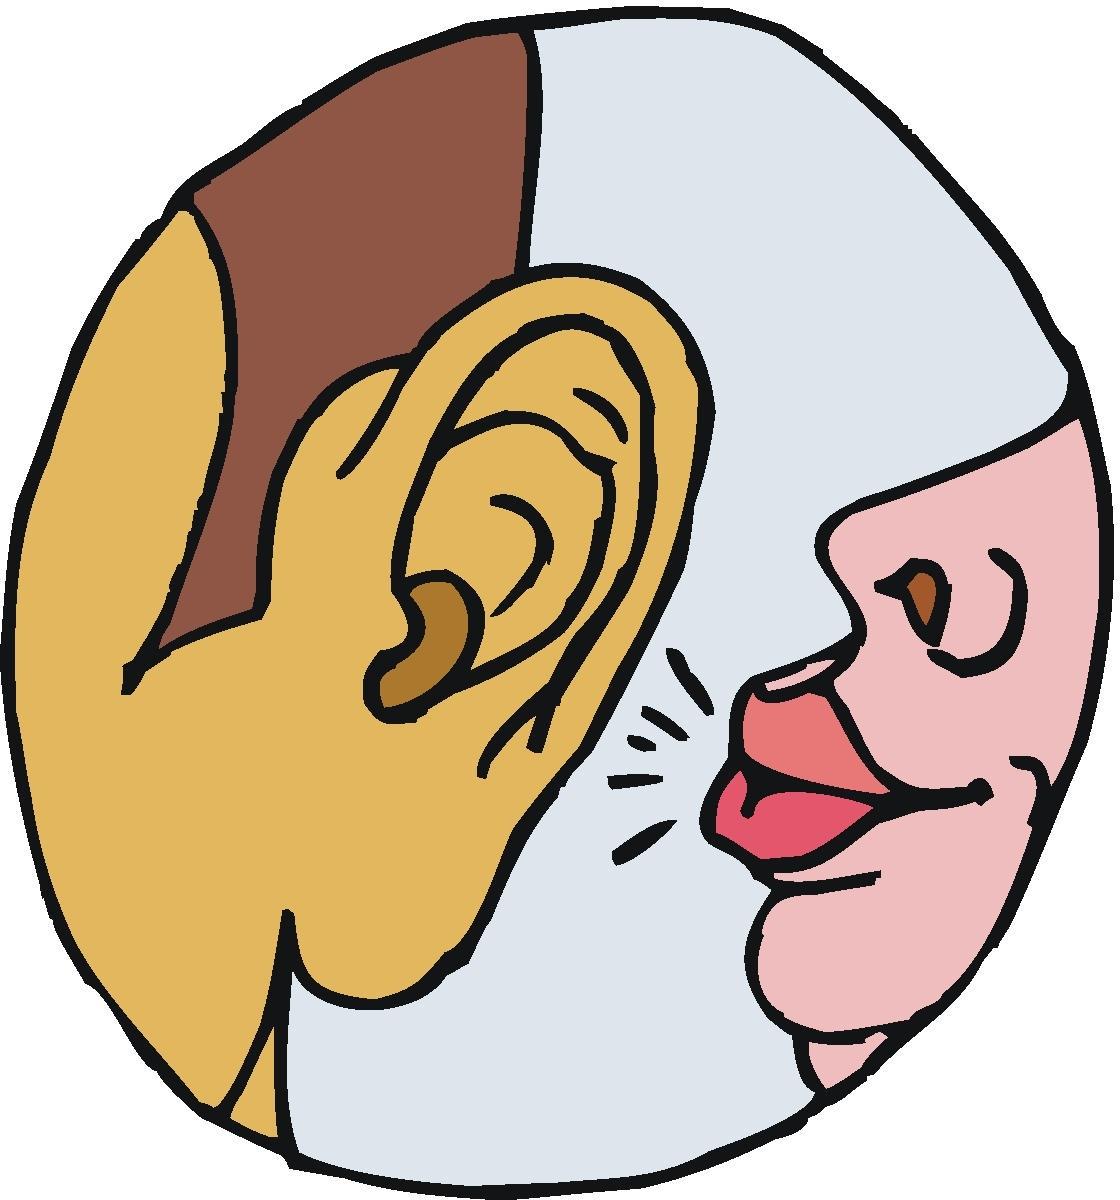 Whisper clipart in ear. Free download best on